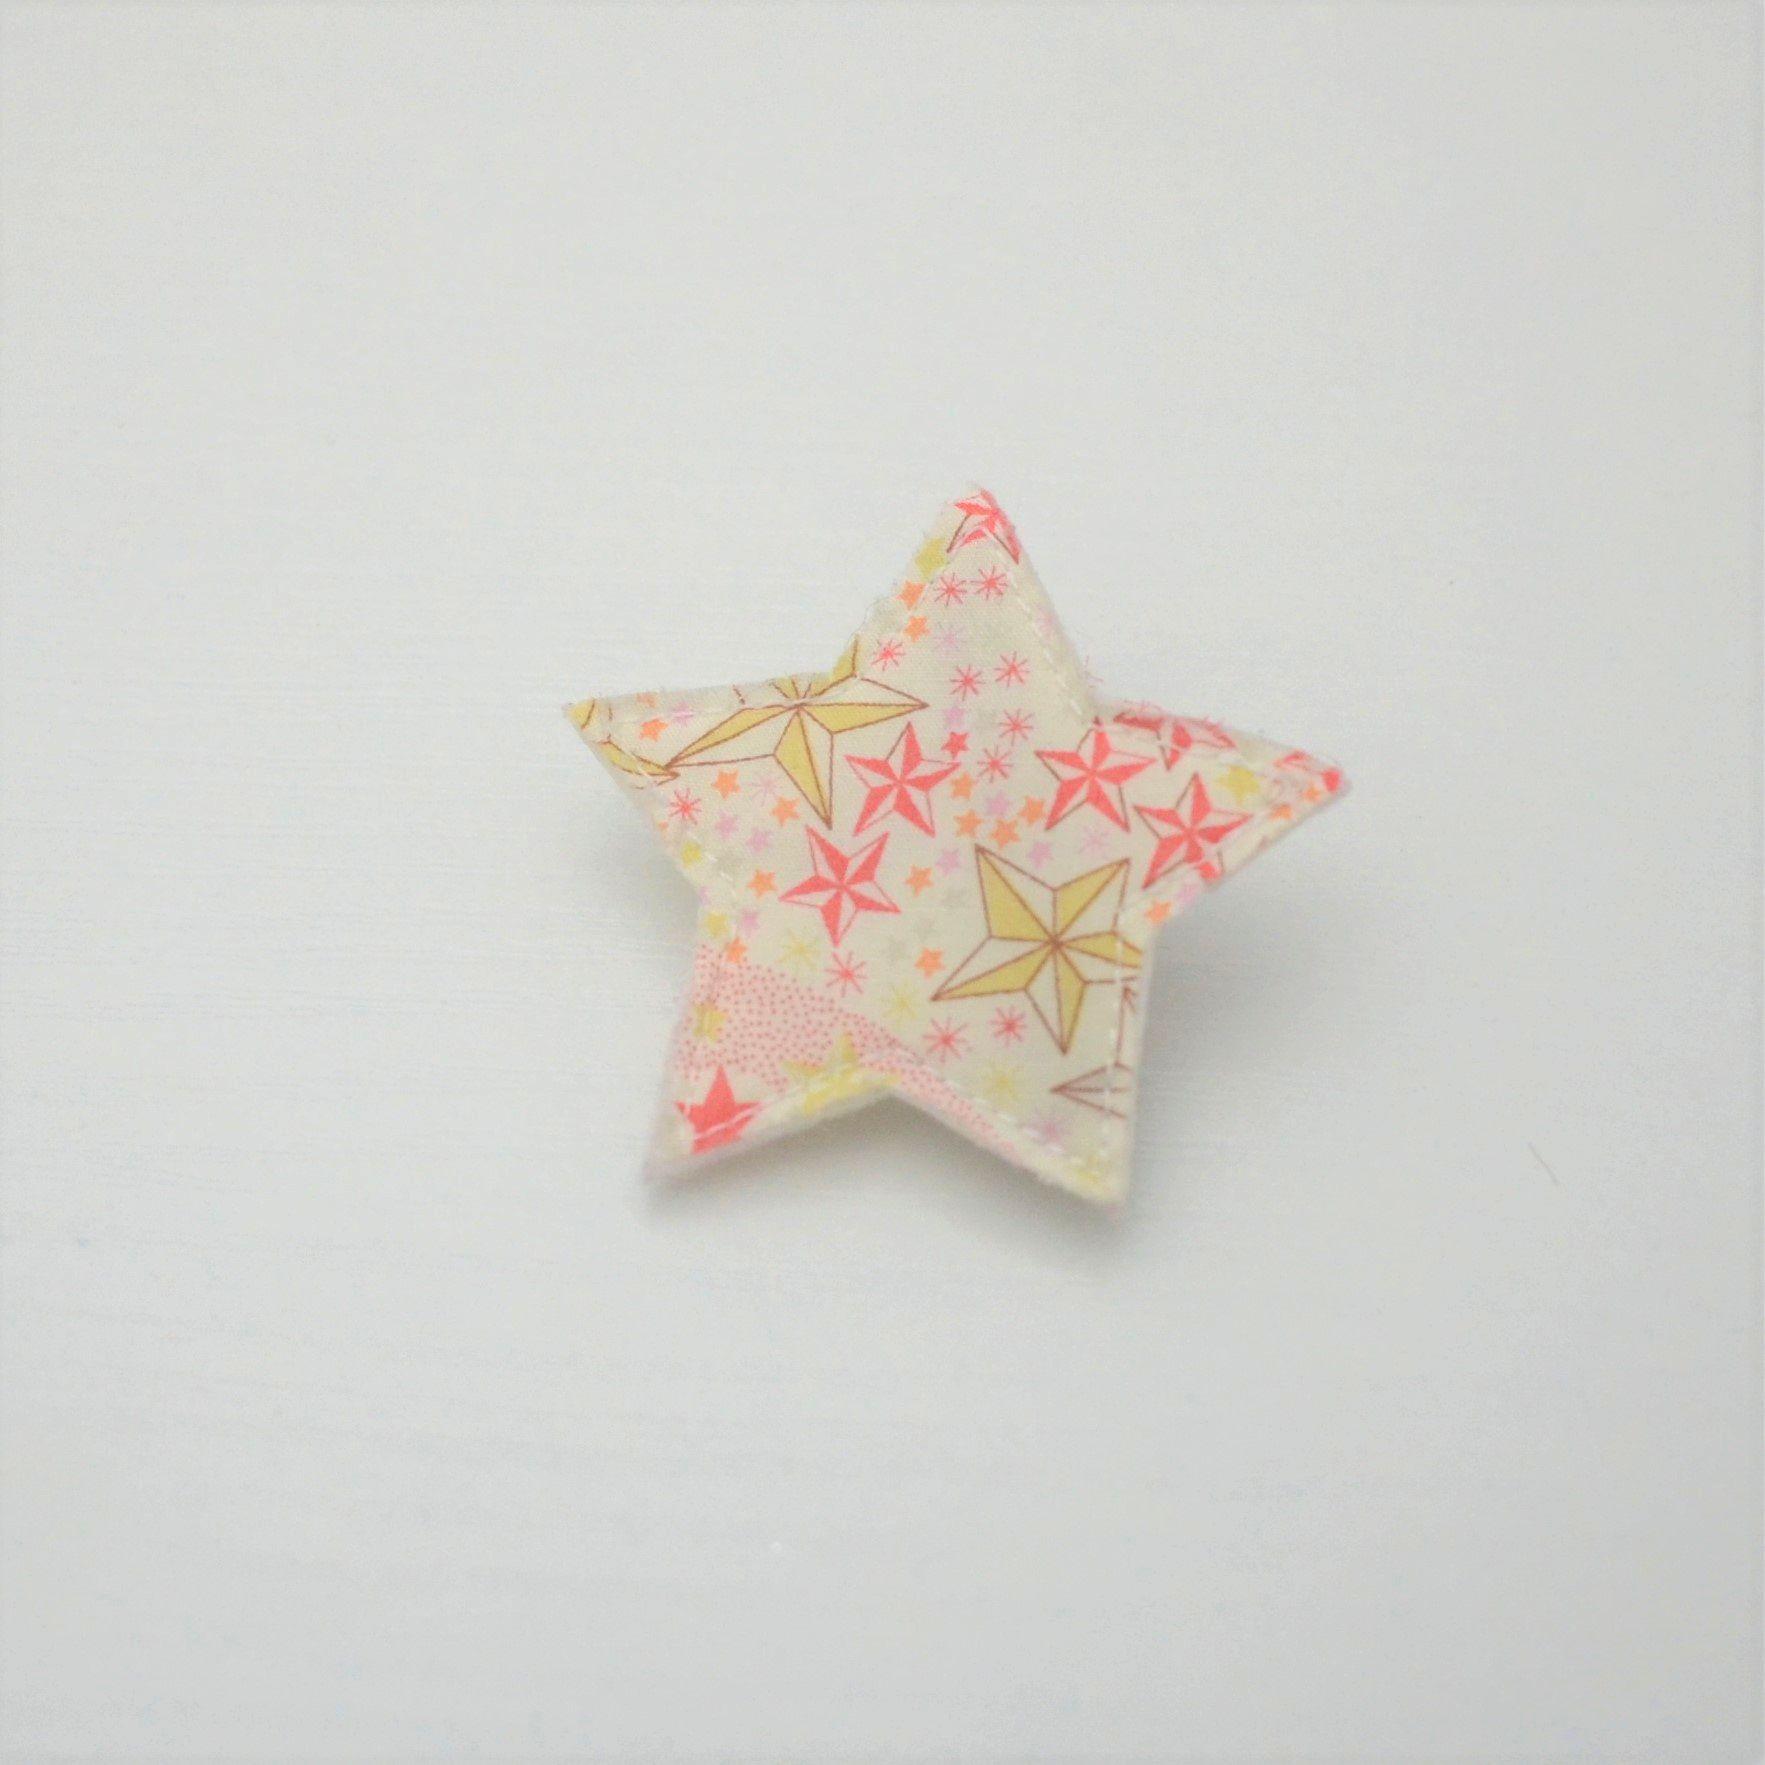 Barette Etoile petite taille Liberty Adelajda Candy--9995232725191